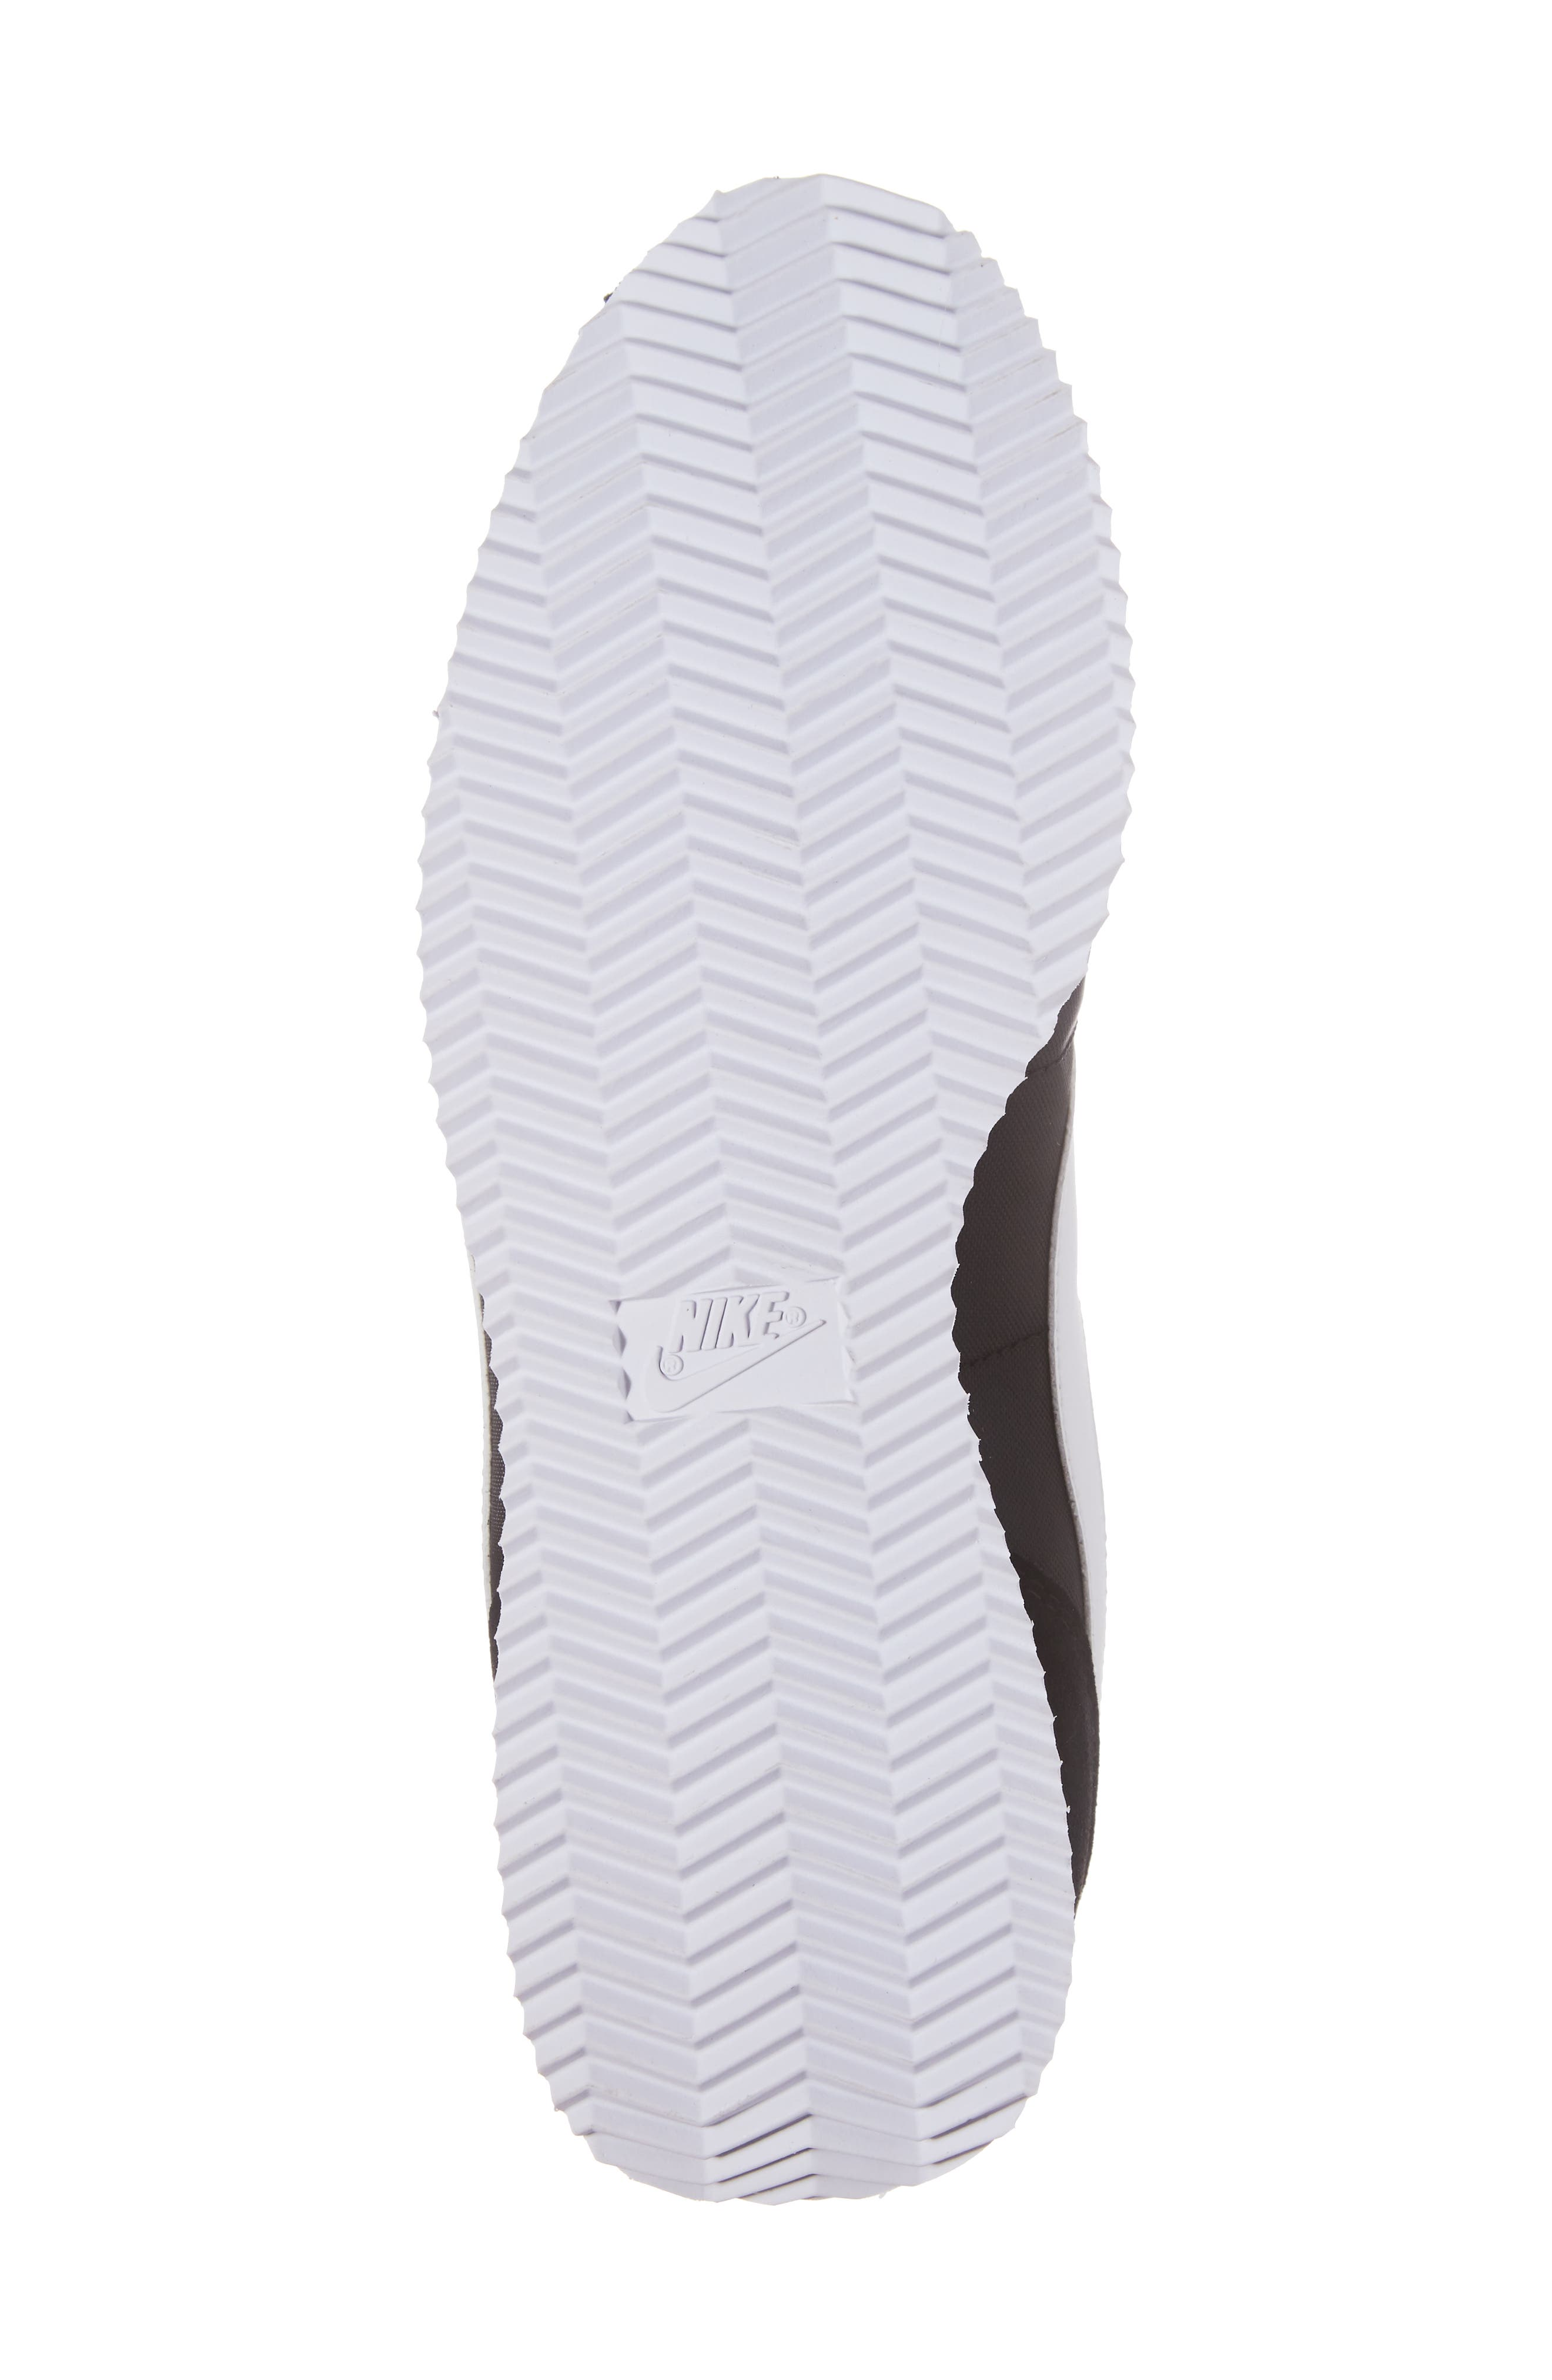 Cortez Basic Nylon Sneaker,                             Alternate thumbnail 6, color,                             BLACK/WHITE/METALLIC SILVER